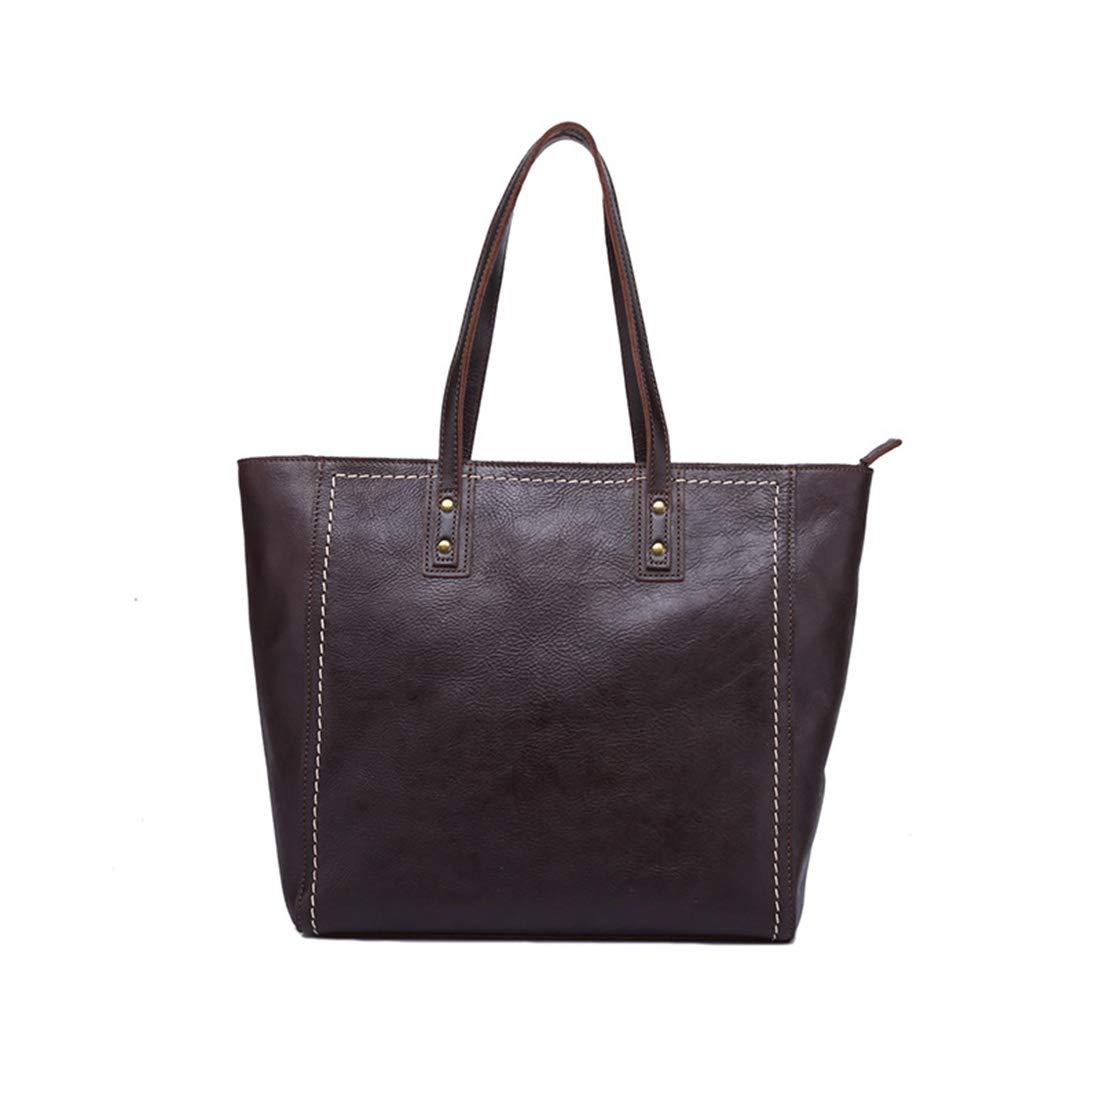 JIANZ-ryggsäck kvinnor kvinnor äkta läder axelväska tygväska handväskor handväska dam portfölj axelväska (färg: grund olja) Djup olja